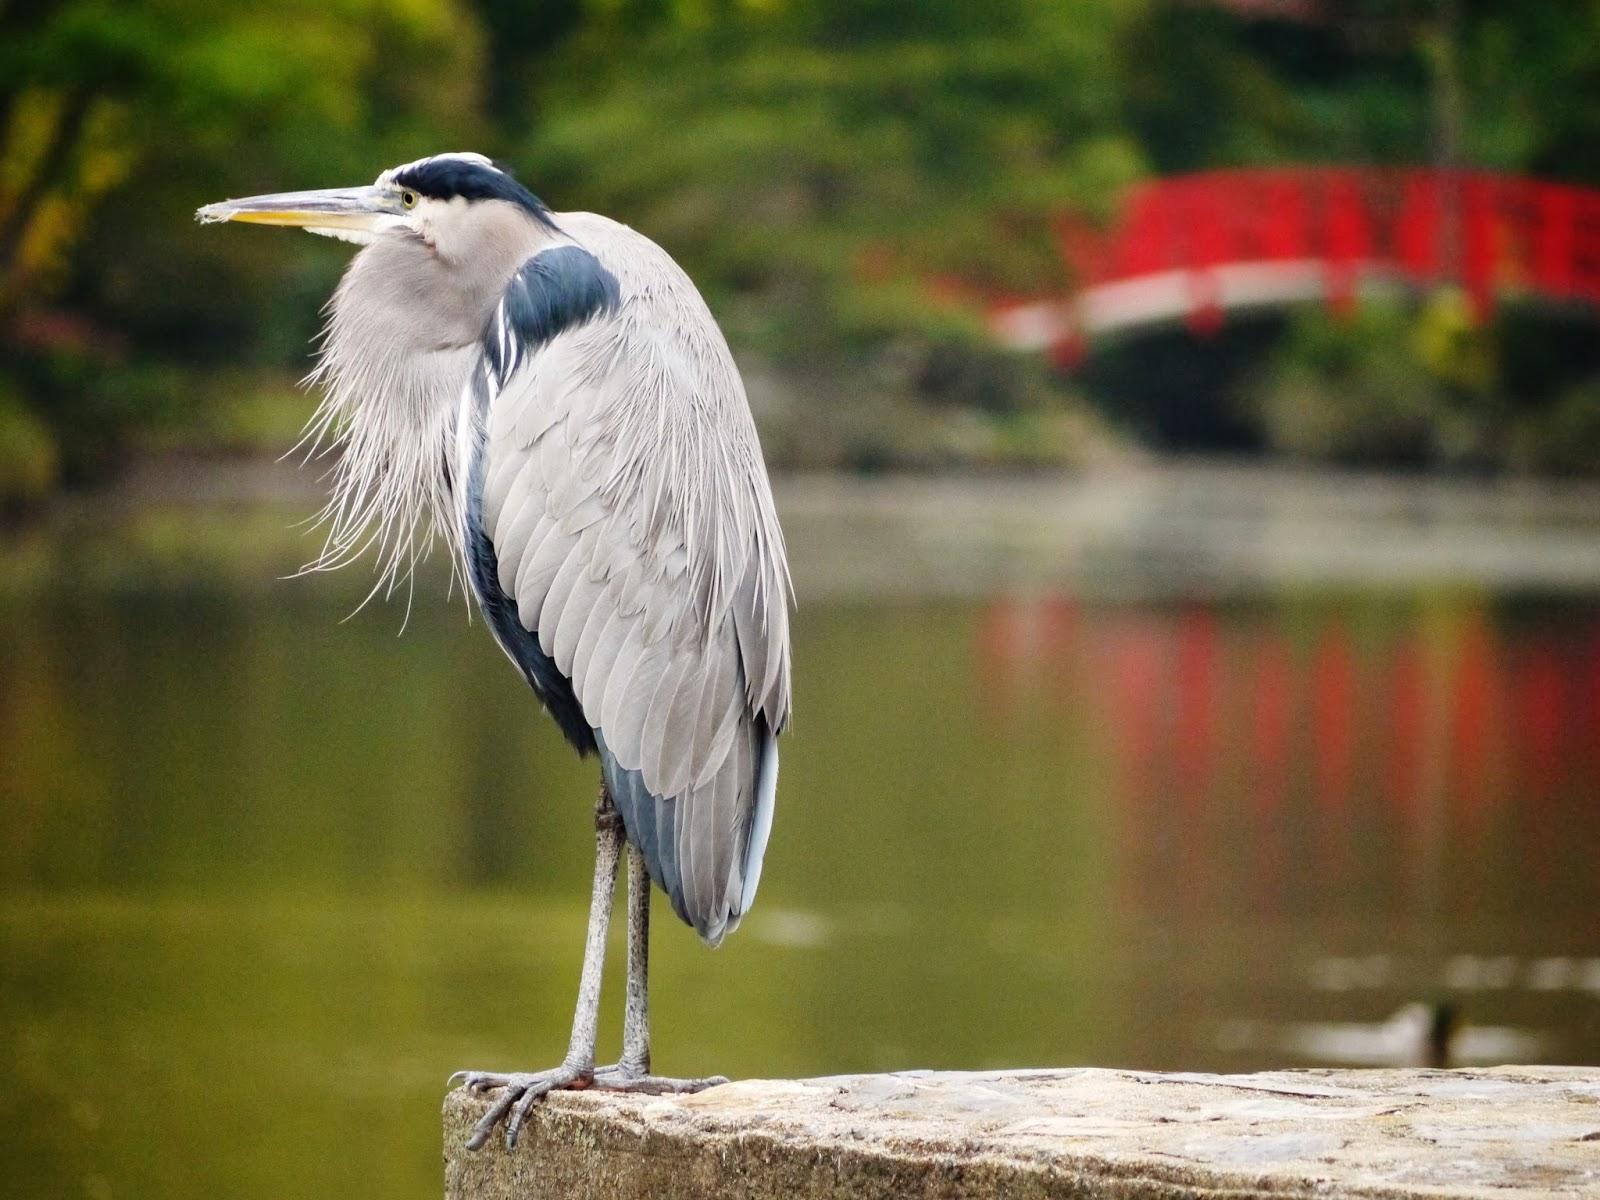 The wildlife garden in the h l blomquist garden of native plants - Great Blue Heron